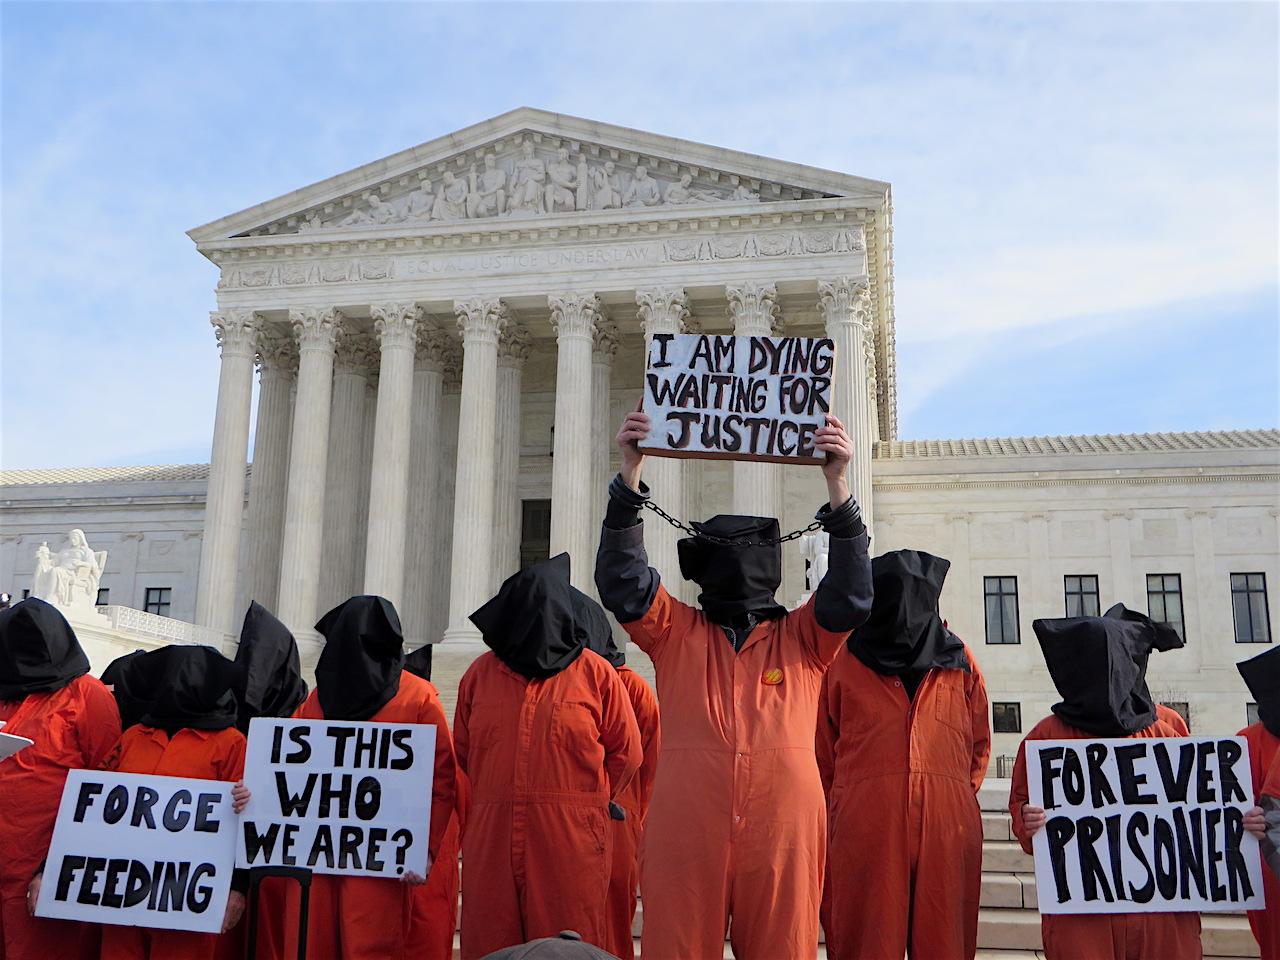 Close Guantanamo protestors outside the Supreme Court, January 11, 2017 (Photo: Andy Worthington).